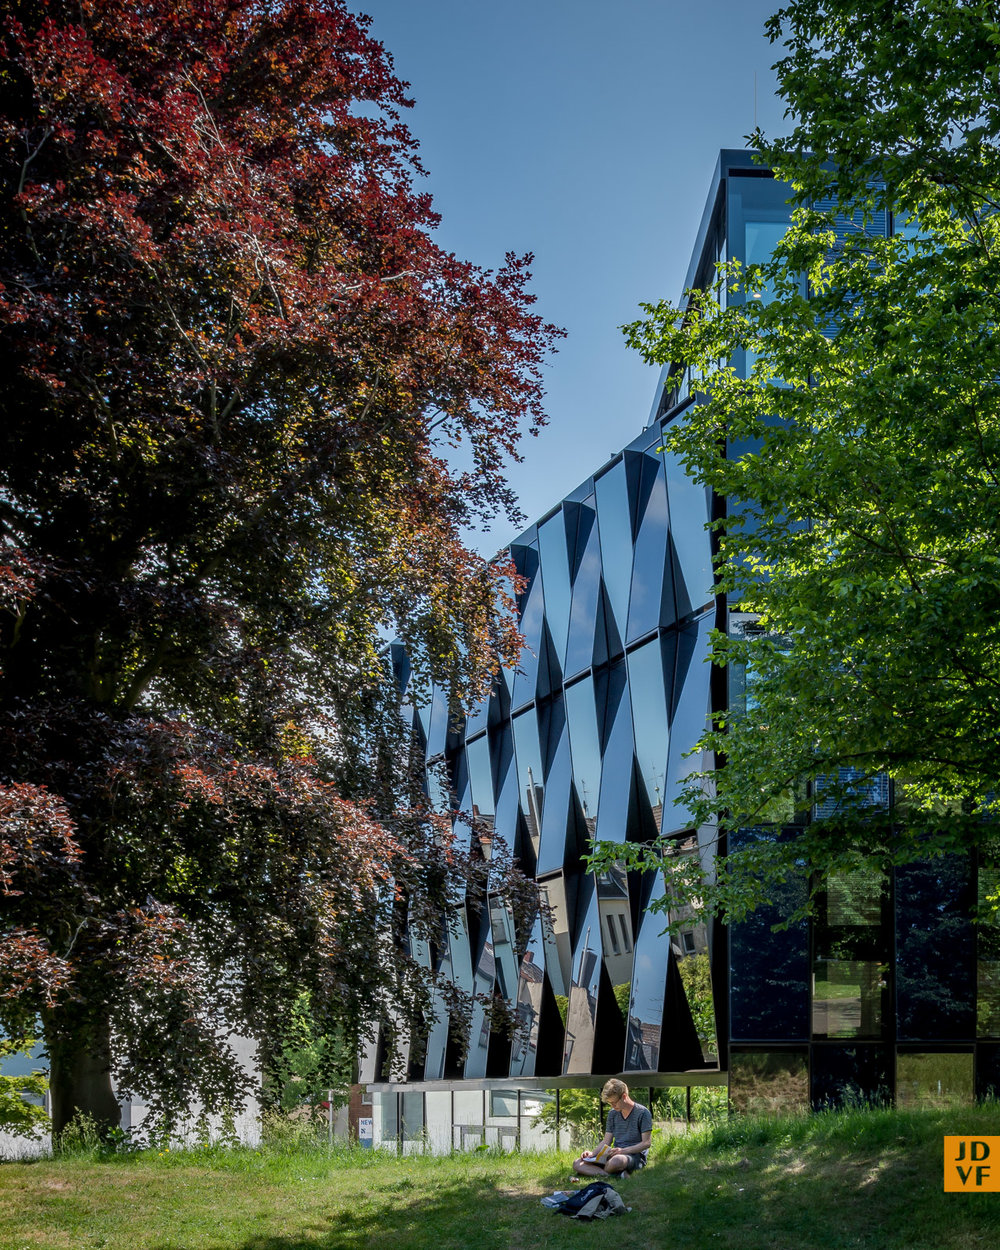 NEW-Blauhaus Mönchengladbach  design: kadawittfeldarchitektur  commissioned: BPD